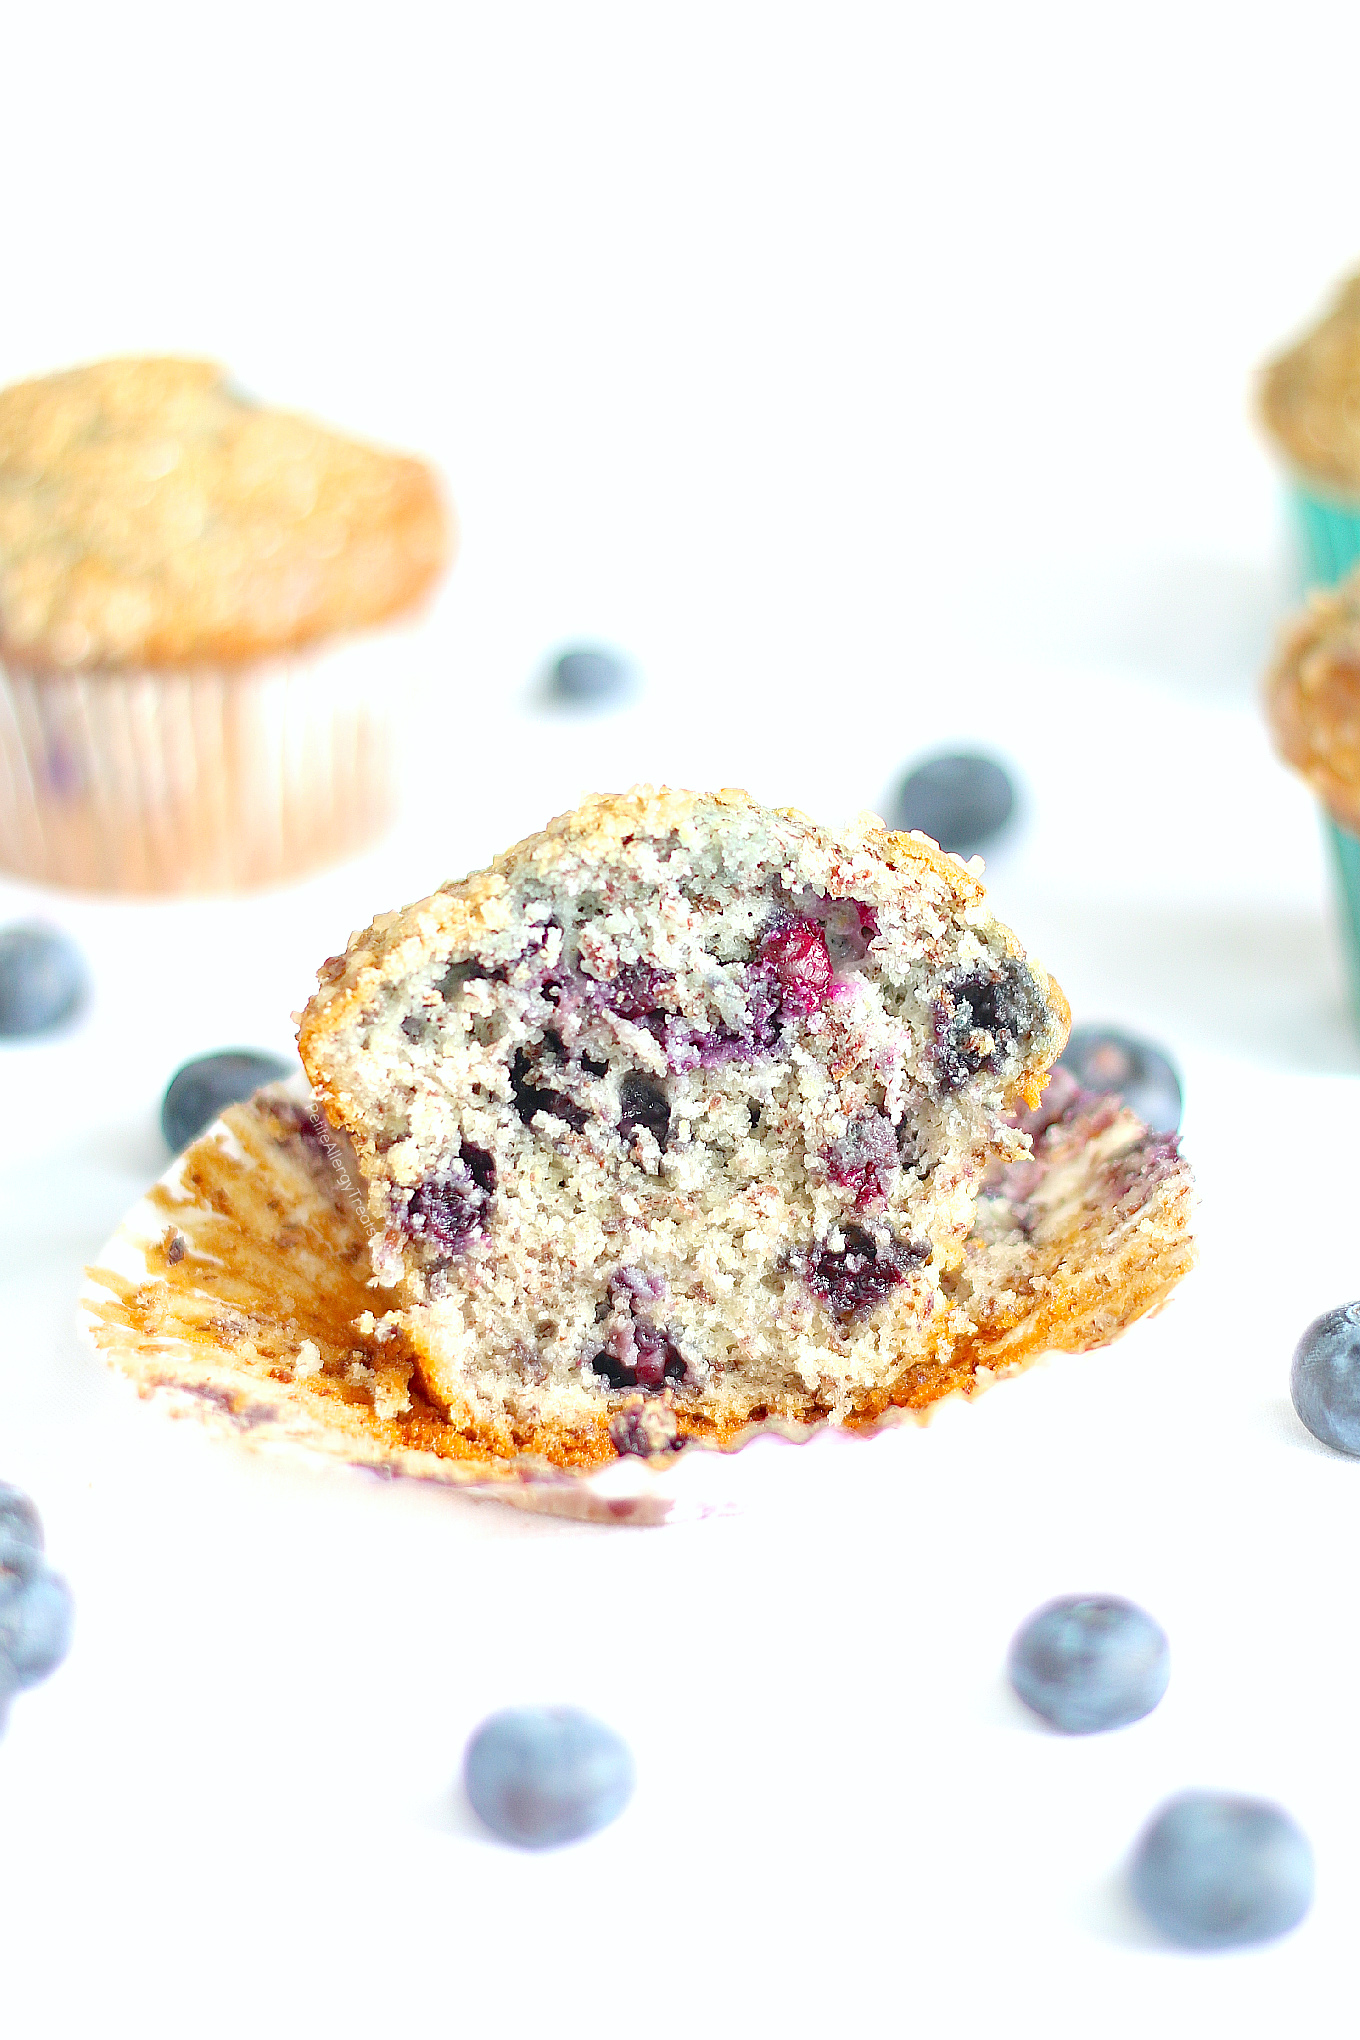 Vegan Blueberry Muffins (gluten free dairy free egg free) Recipe- Delicious HUGE Bakery style gluten free blueberry muffins! Super #FoodAllergy friendly- #dairyfree, #eggfree, #nutfree #soyfree